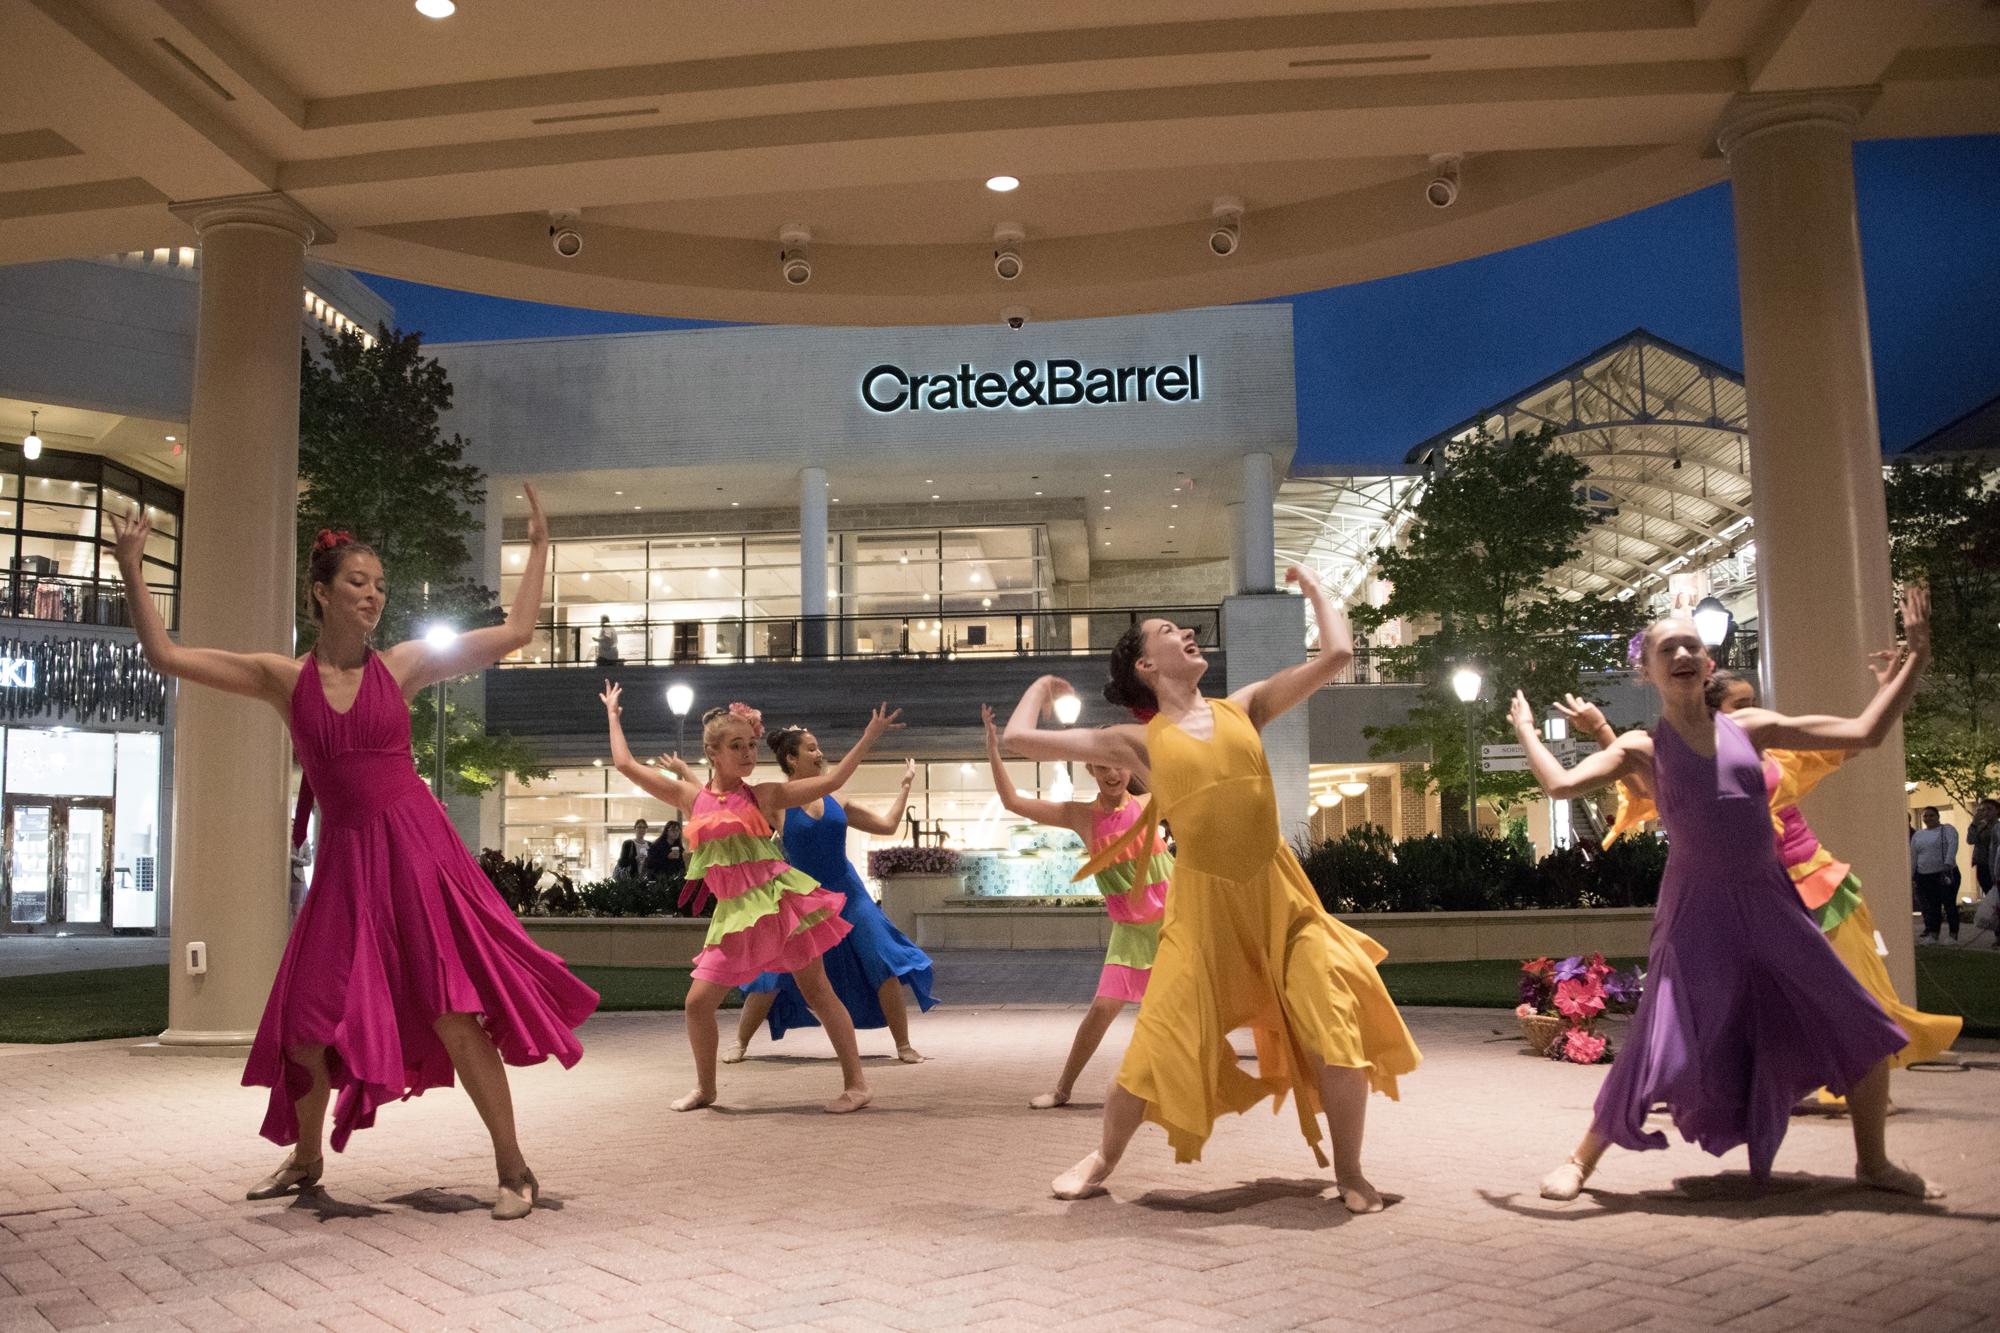 117 Latin Ballet Culture Works [Tom Topinka] 10-12-17 .jpg